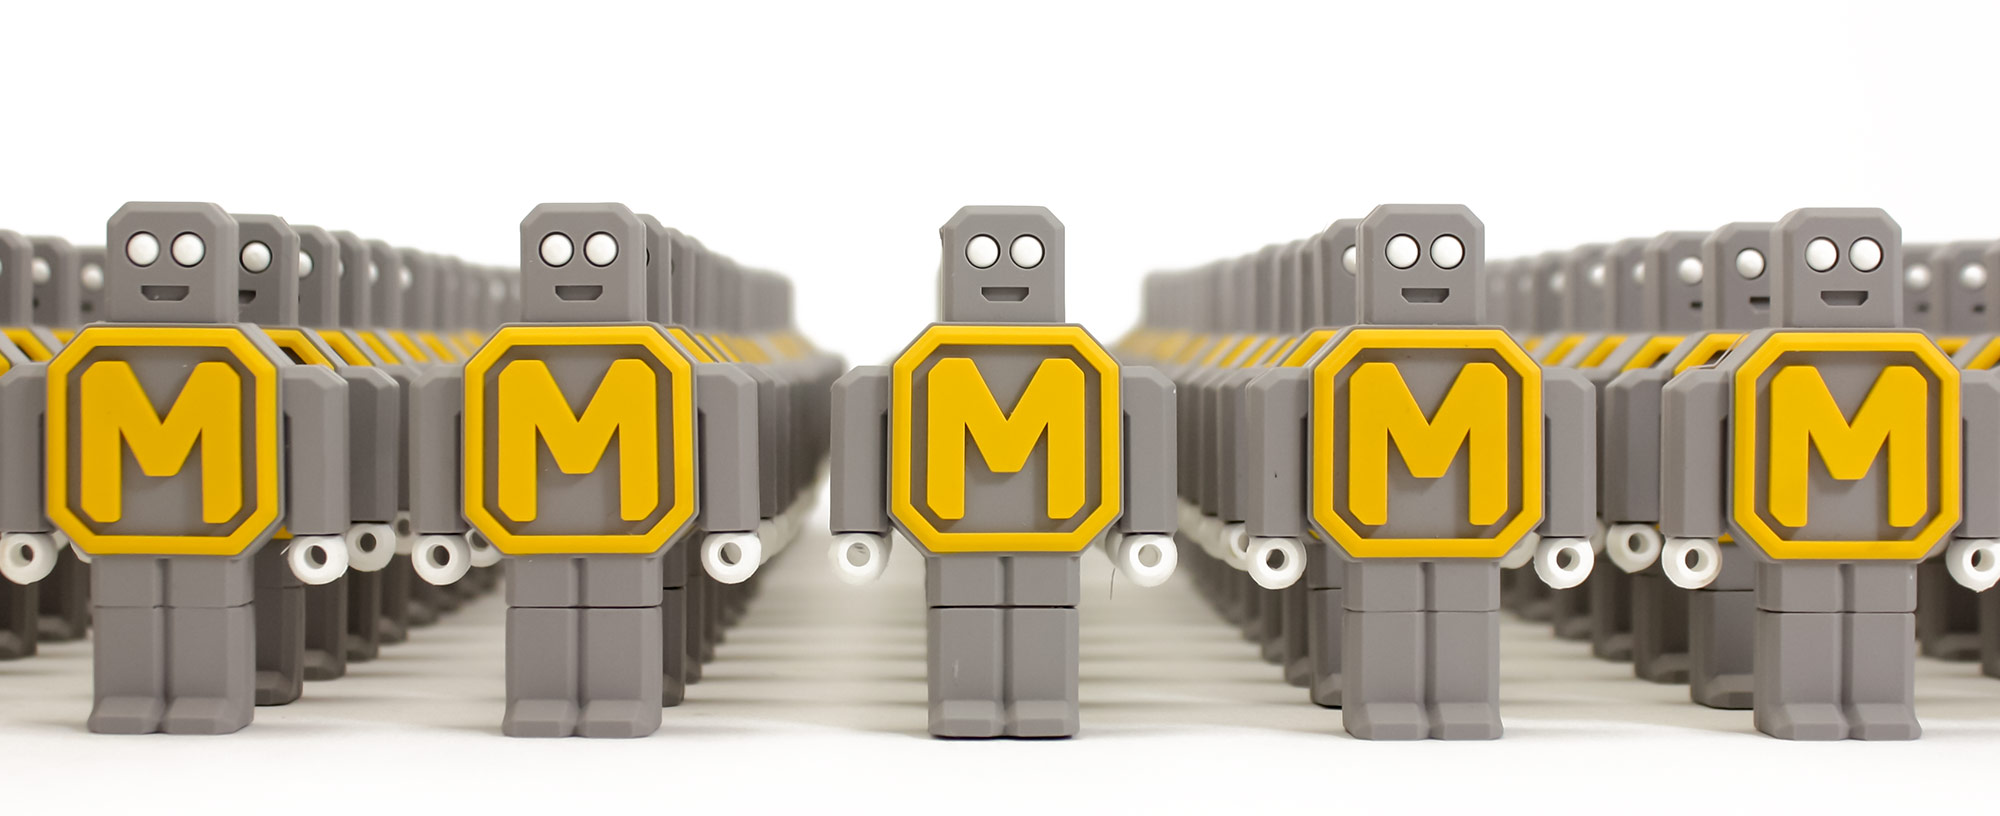 modkit custom robot usb flash drive